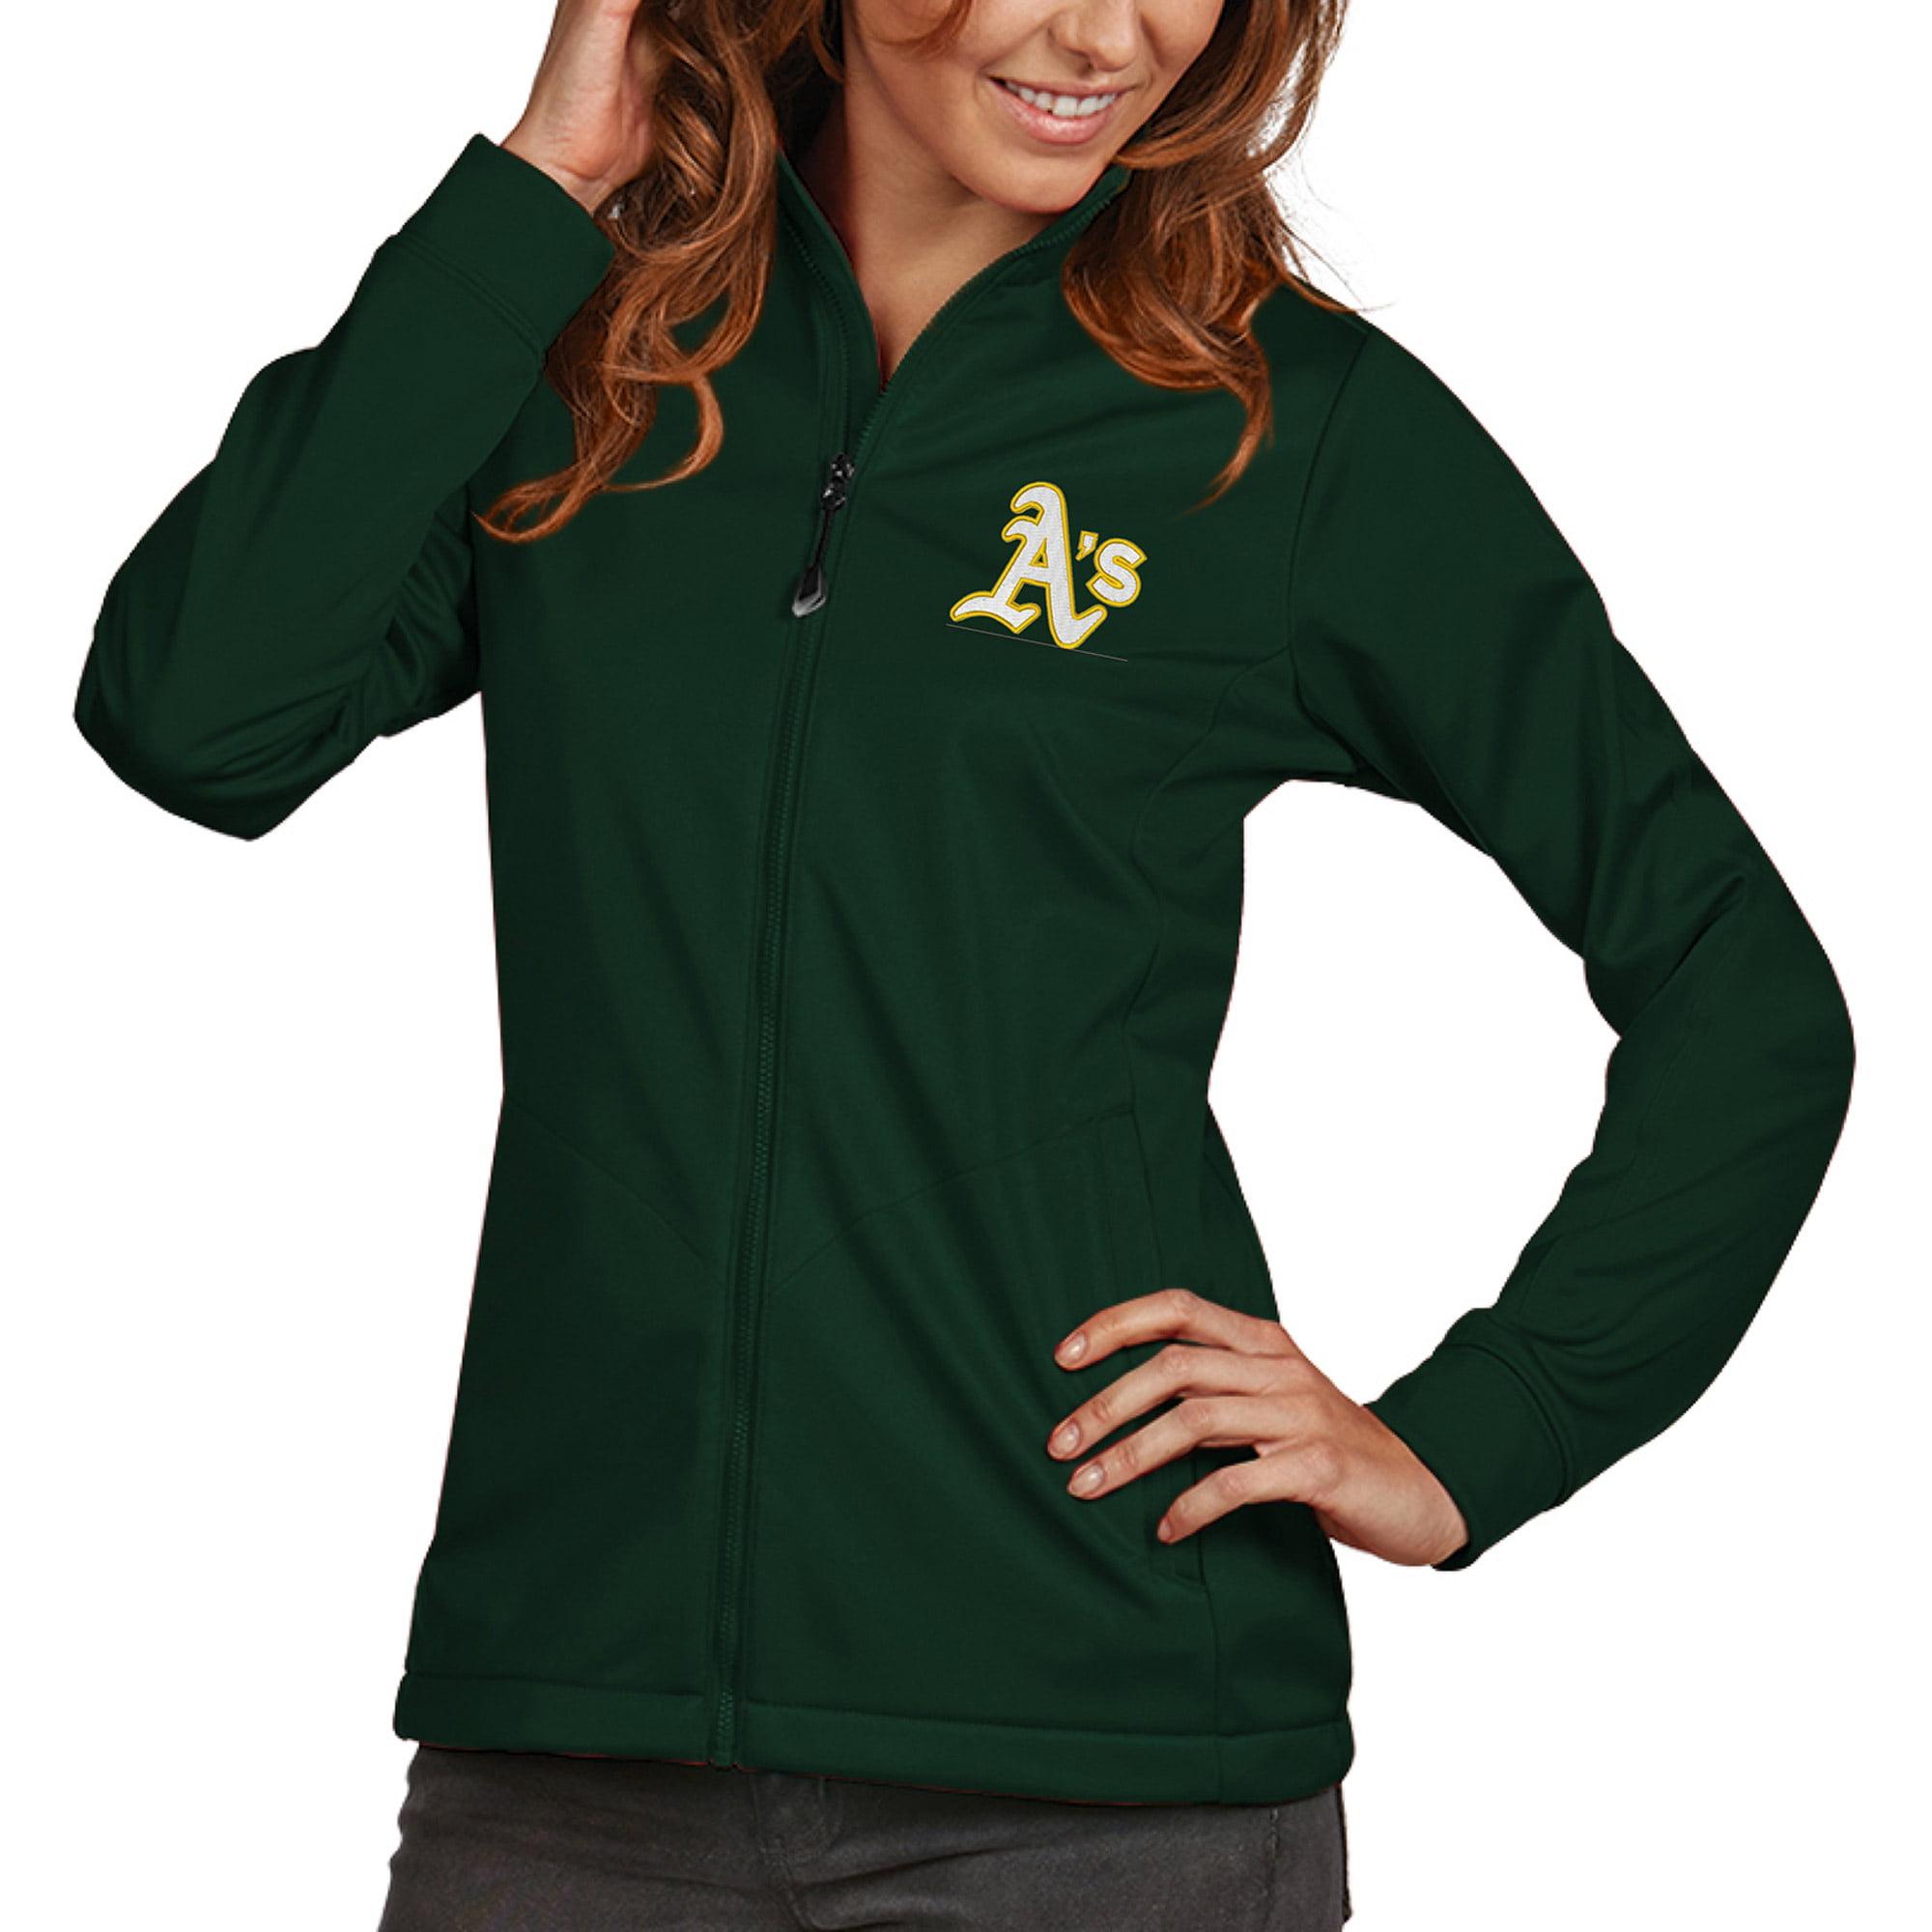 Oakland Athletics Antigua Women's Golf Full-Zip Jacket - Green